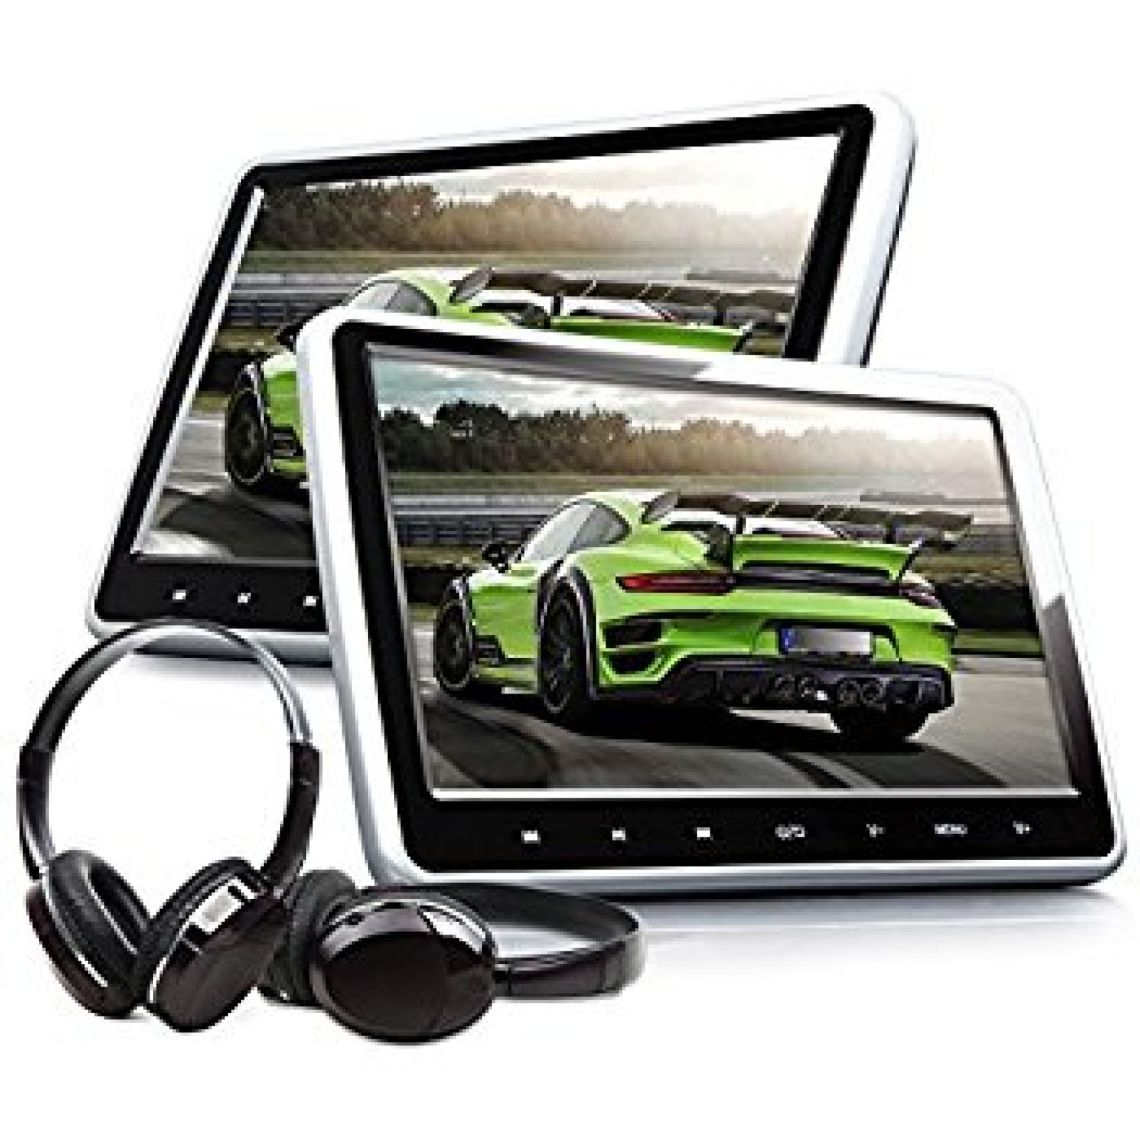 Amazon.com: Car Headrest Dvd Player, LESHP 10.1 inch Ultra-thin HD 720P Digital TFT Screen Design Car Headrest DVD Player X10D 806D 606D Multimedia Player Headrest Monitor with USB port/SD/MMC/HDMI Port: Car Electronics